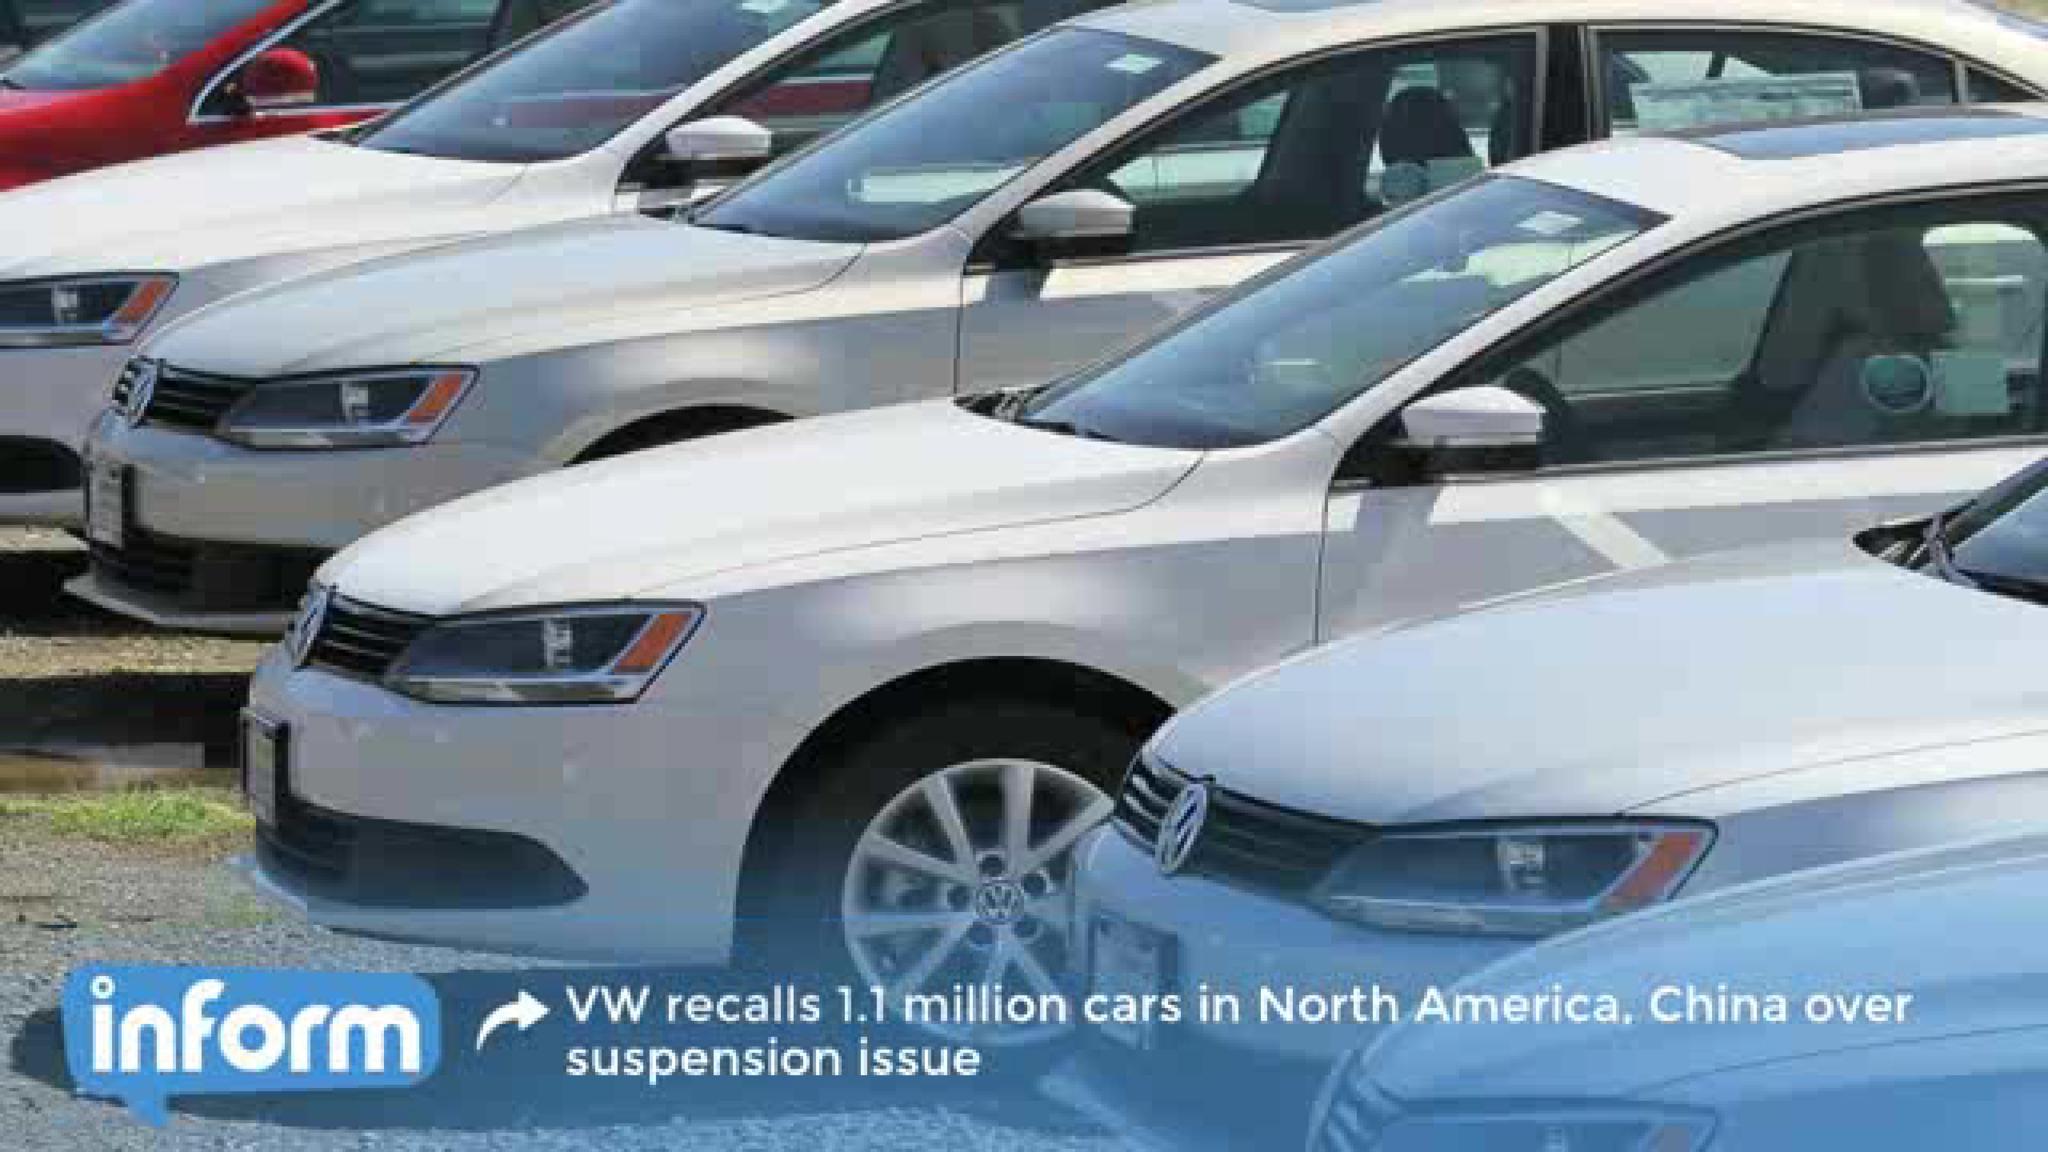 central news quarters jetta three volkswagen joseph recalls rear tiguan recall hybrid capparella